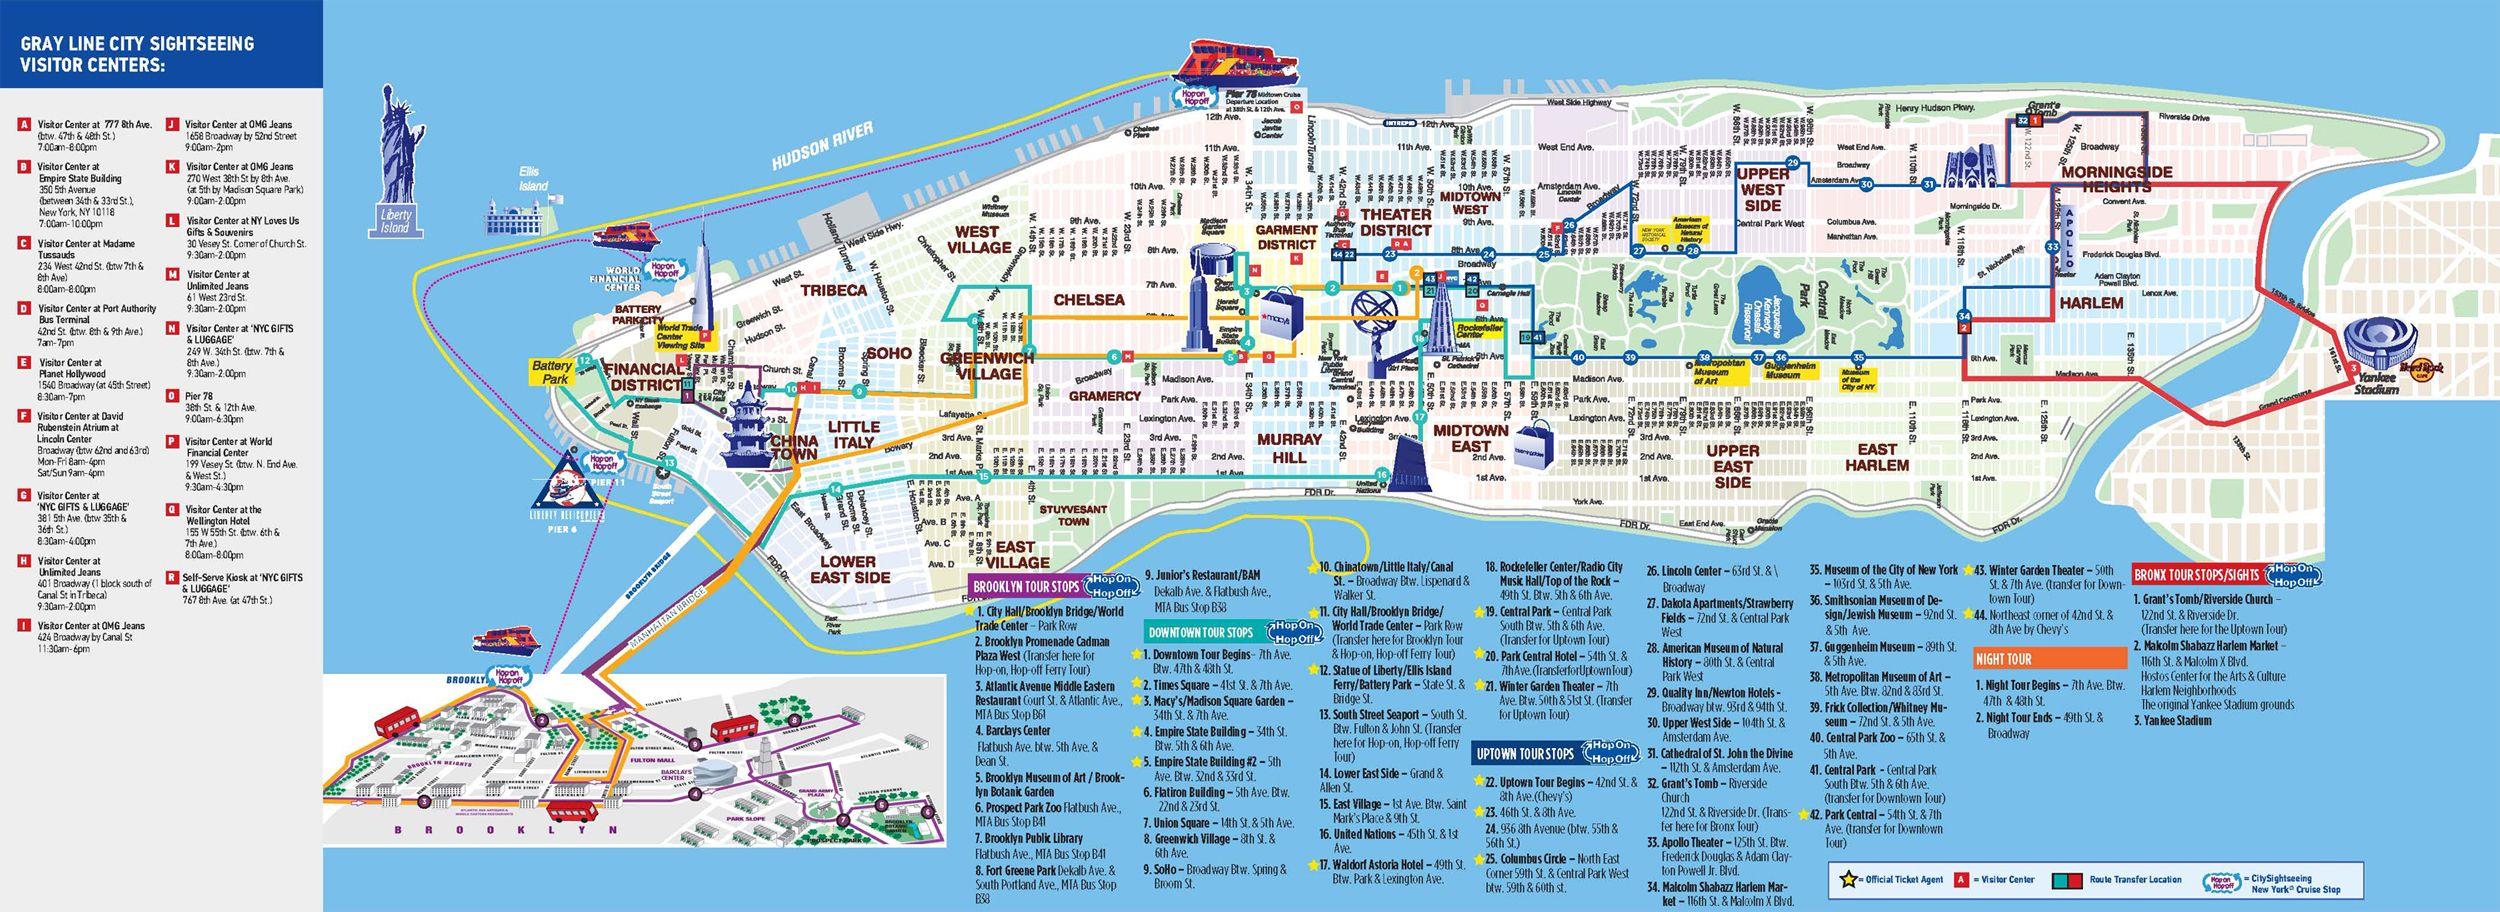 New York City Manhattan Printable Tourist Map Sygic Travel Map Of - Nyc zip code map pdf